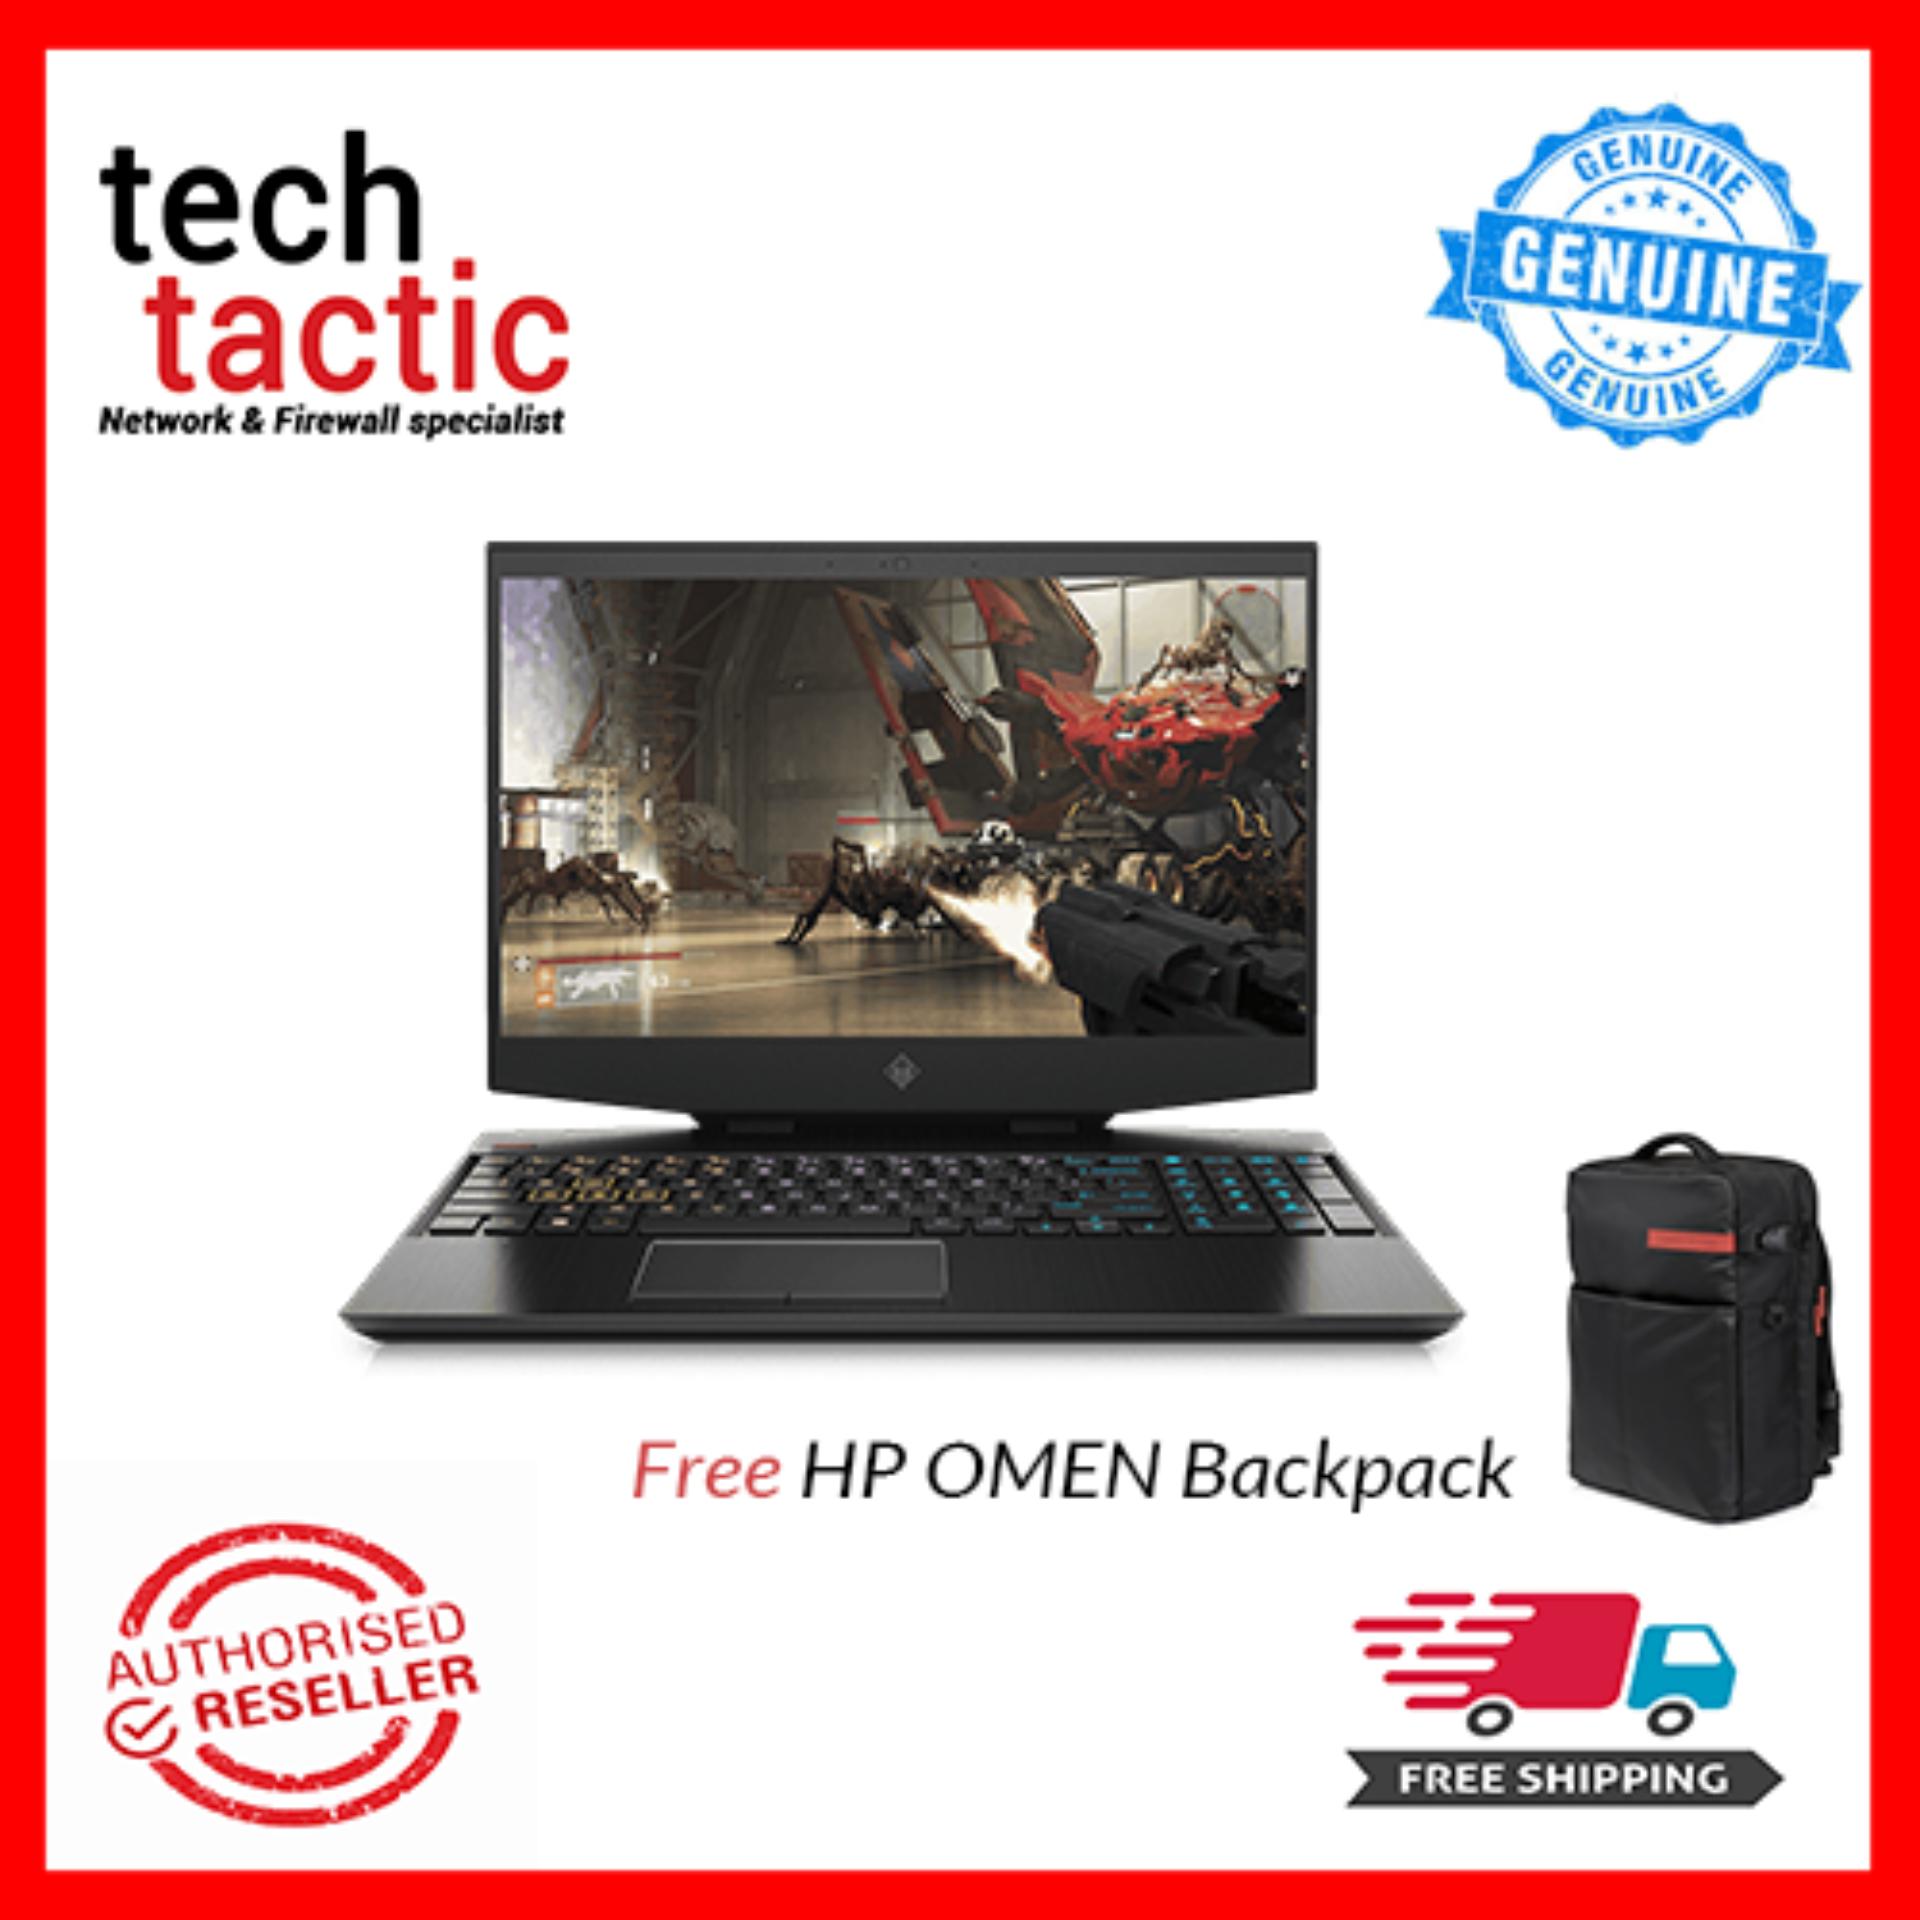 Hewlett-Packard HP OMEN 15-dh0038TX  15.6 Inch FHD Laptop Black  (Intel Core i7-9750H,8GB, 1TB HDD+256GB SSD,NVIDIA GeForce RTX 2060 6GB,Win10) Malaysia